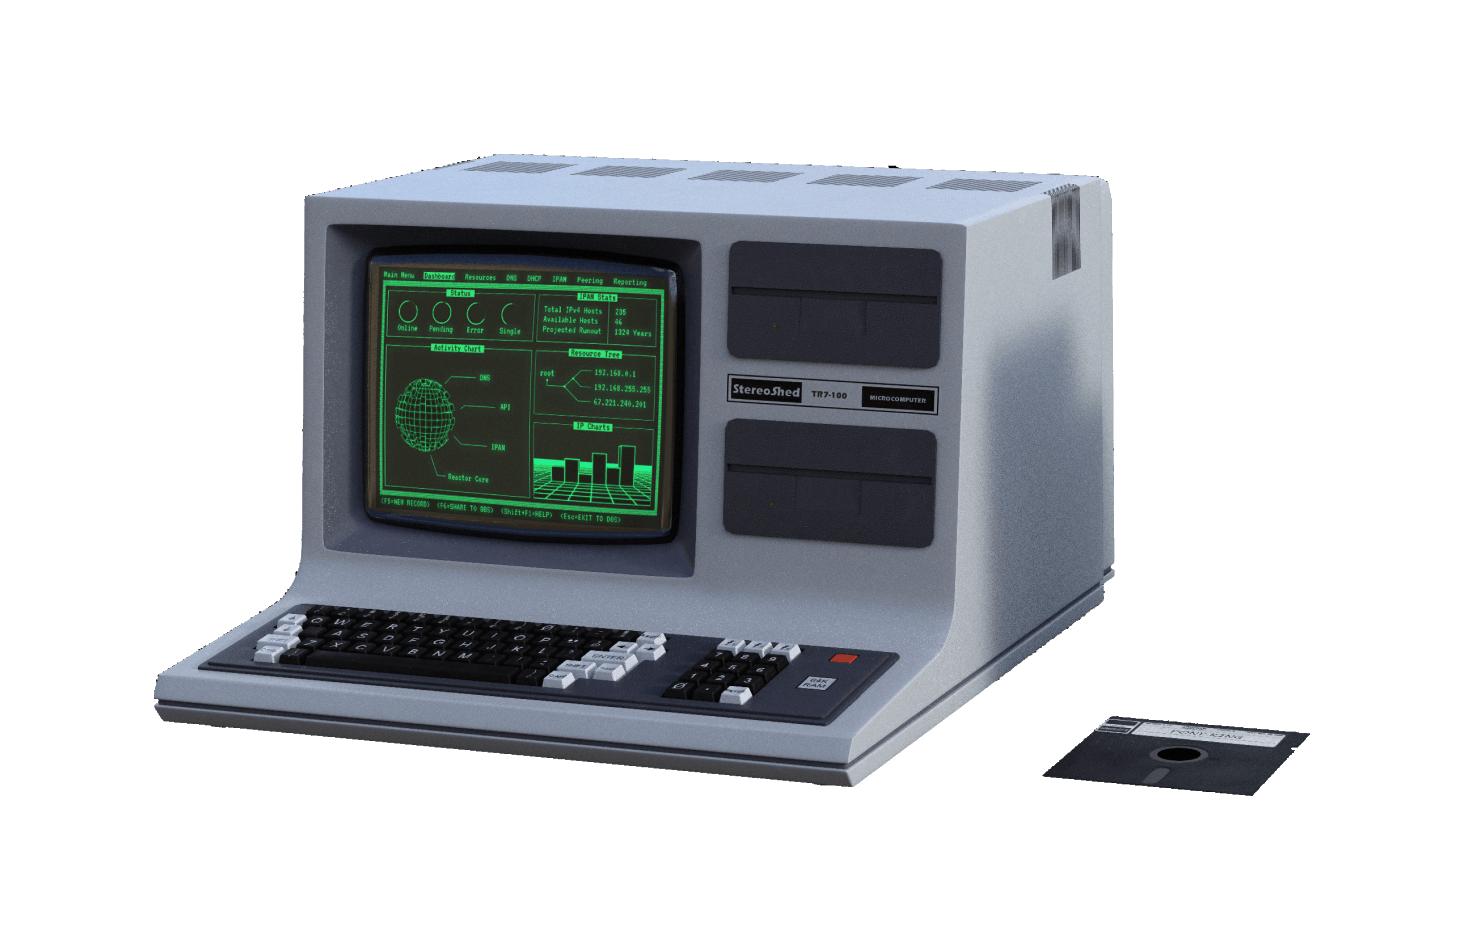 Totally super modern computer running ProVision 85